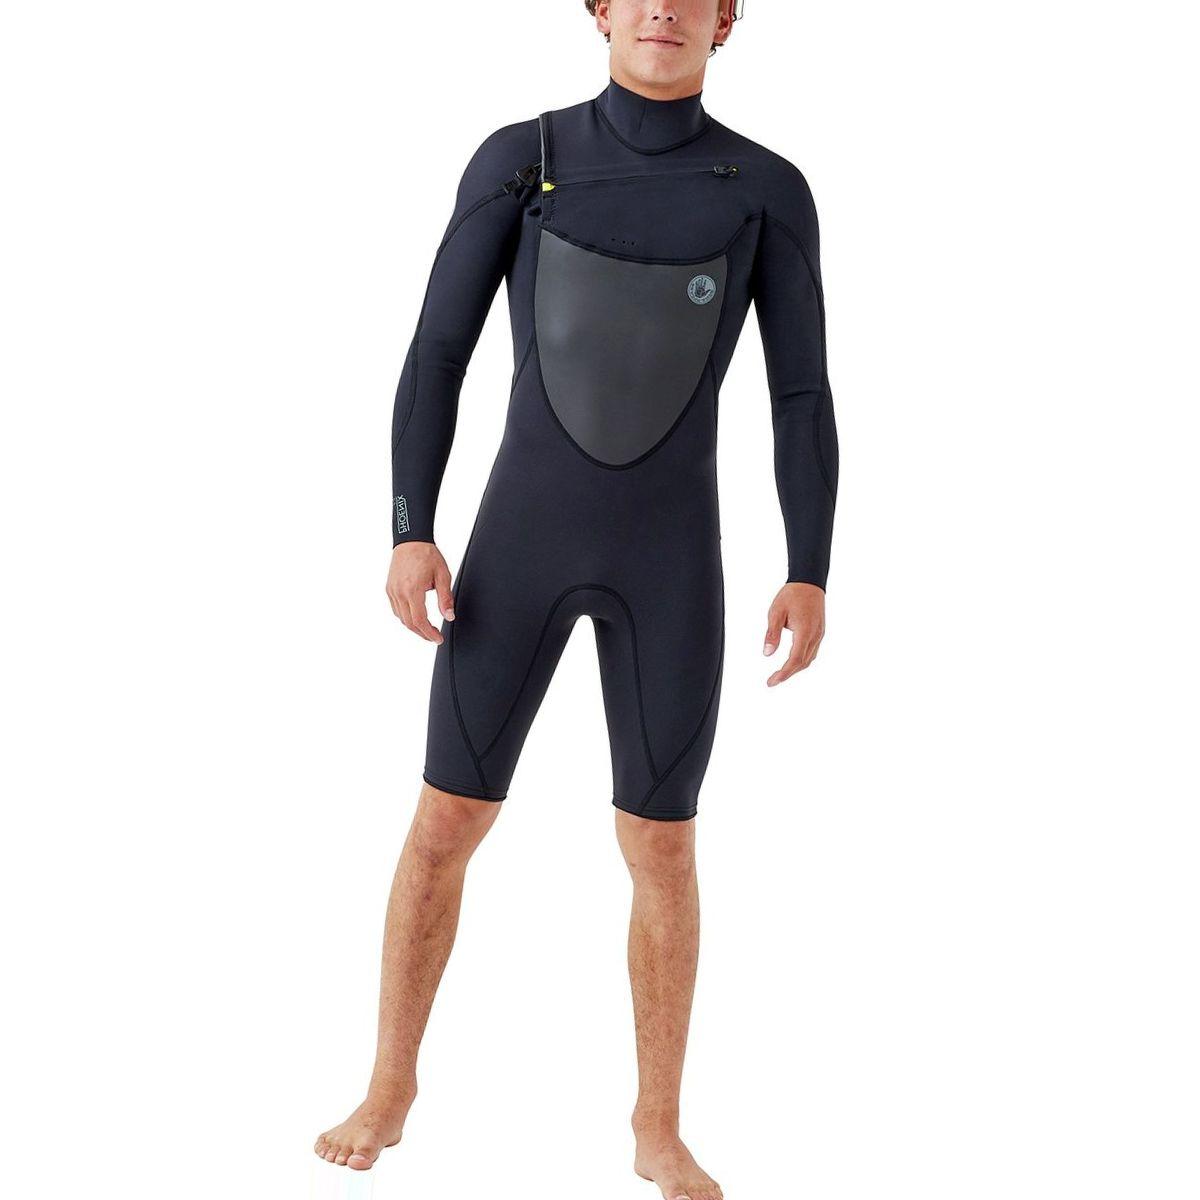 Body Glove Phoenix Slant Zip L/A 2MM Full Wetsuit - Men's